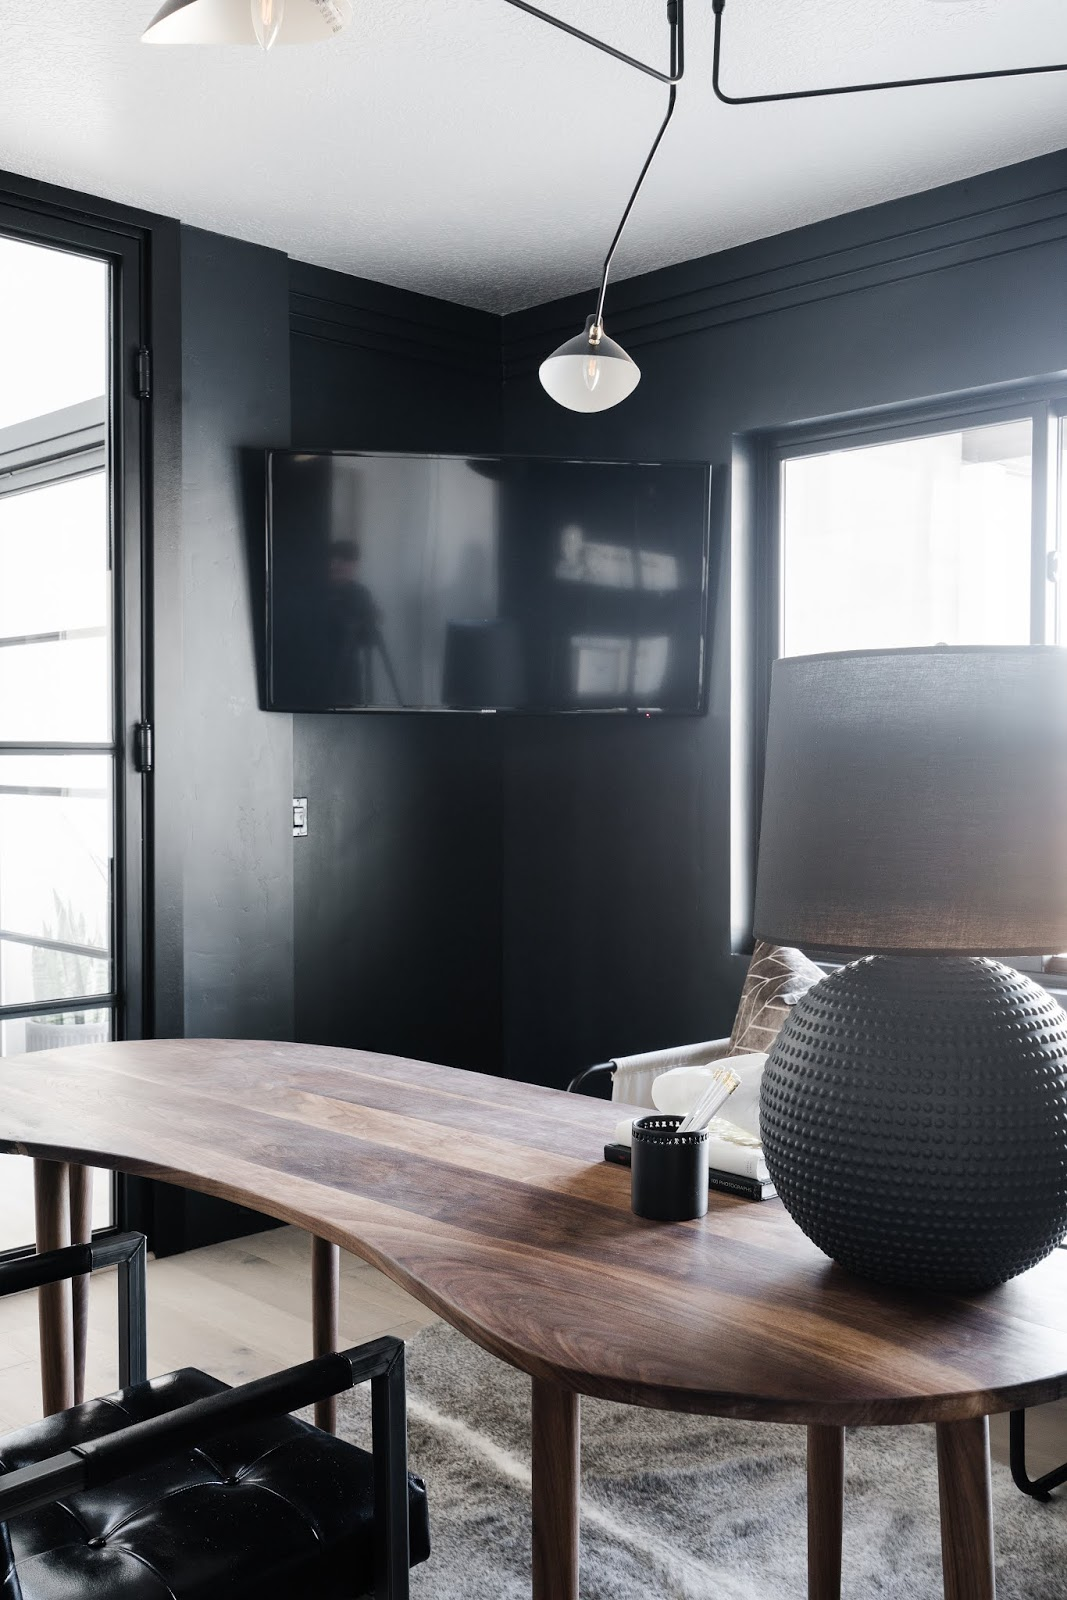 Office TV, Masculine Office Desk